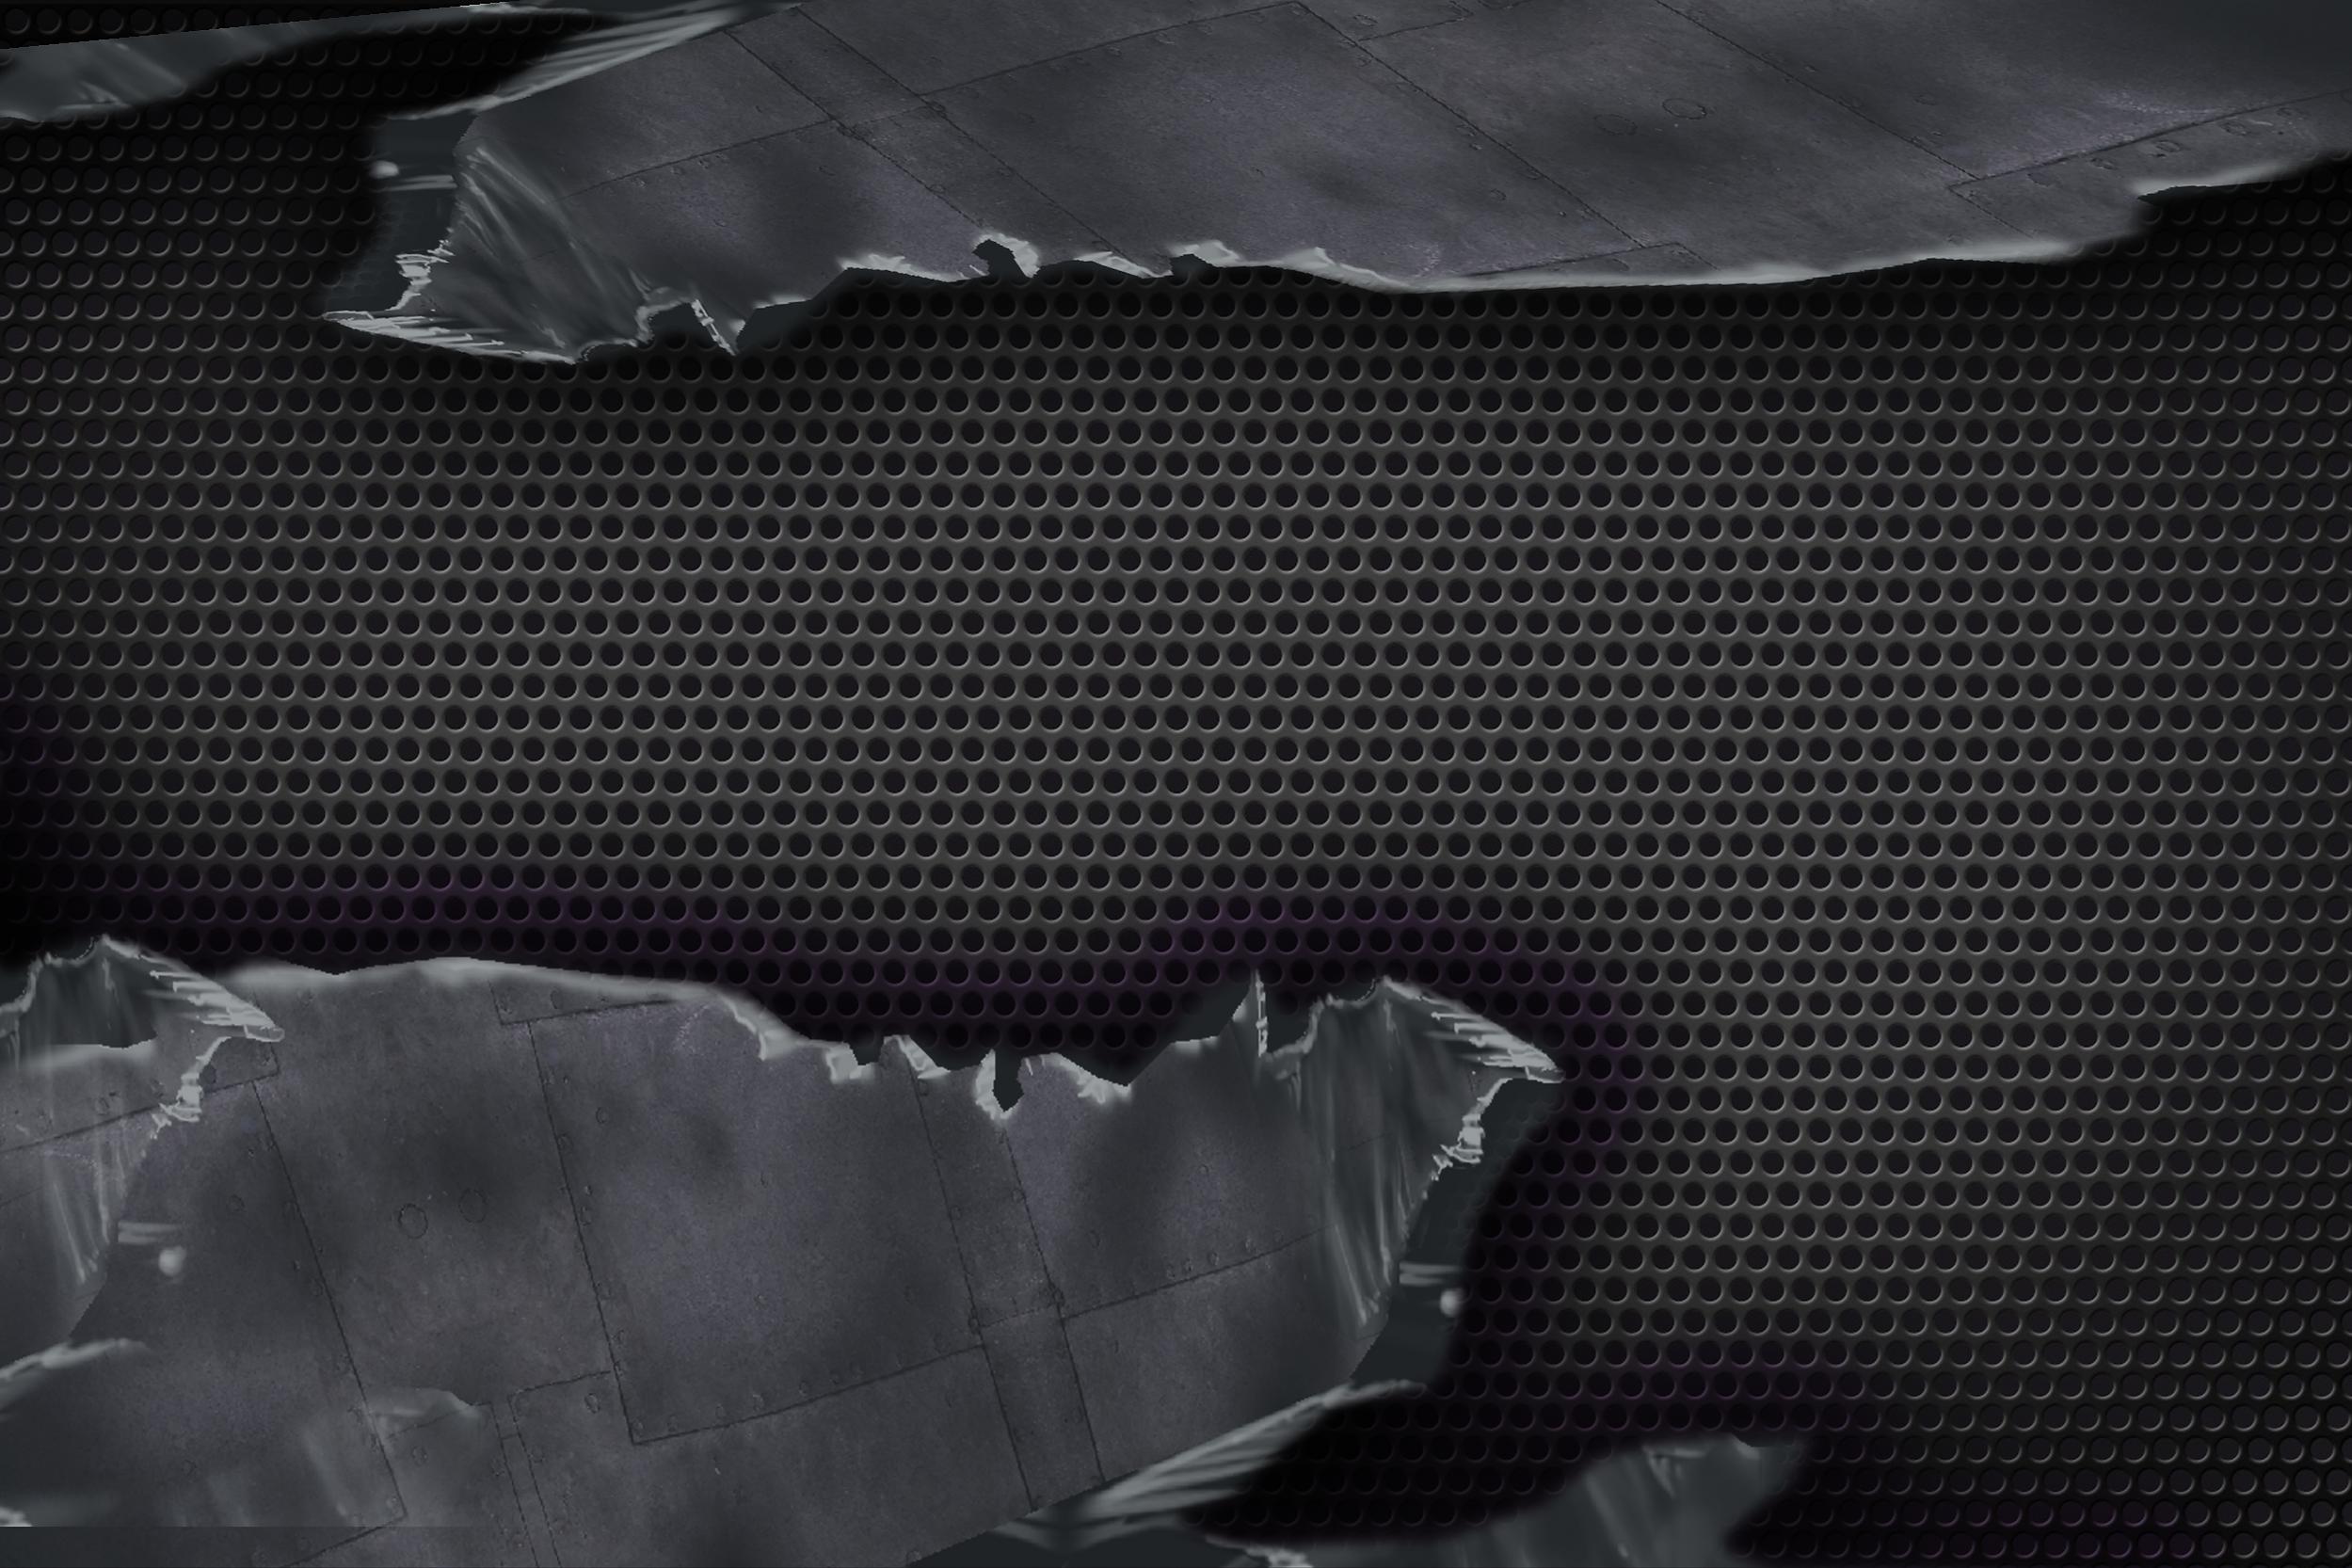 KG-Truck-Web-2500x1667-Ripped_Metal-bann